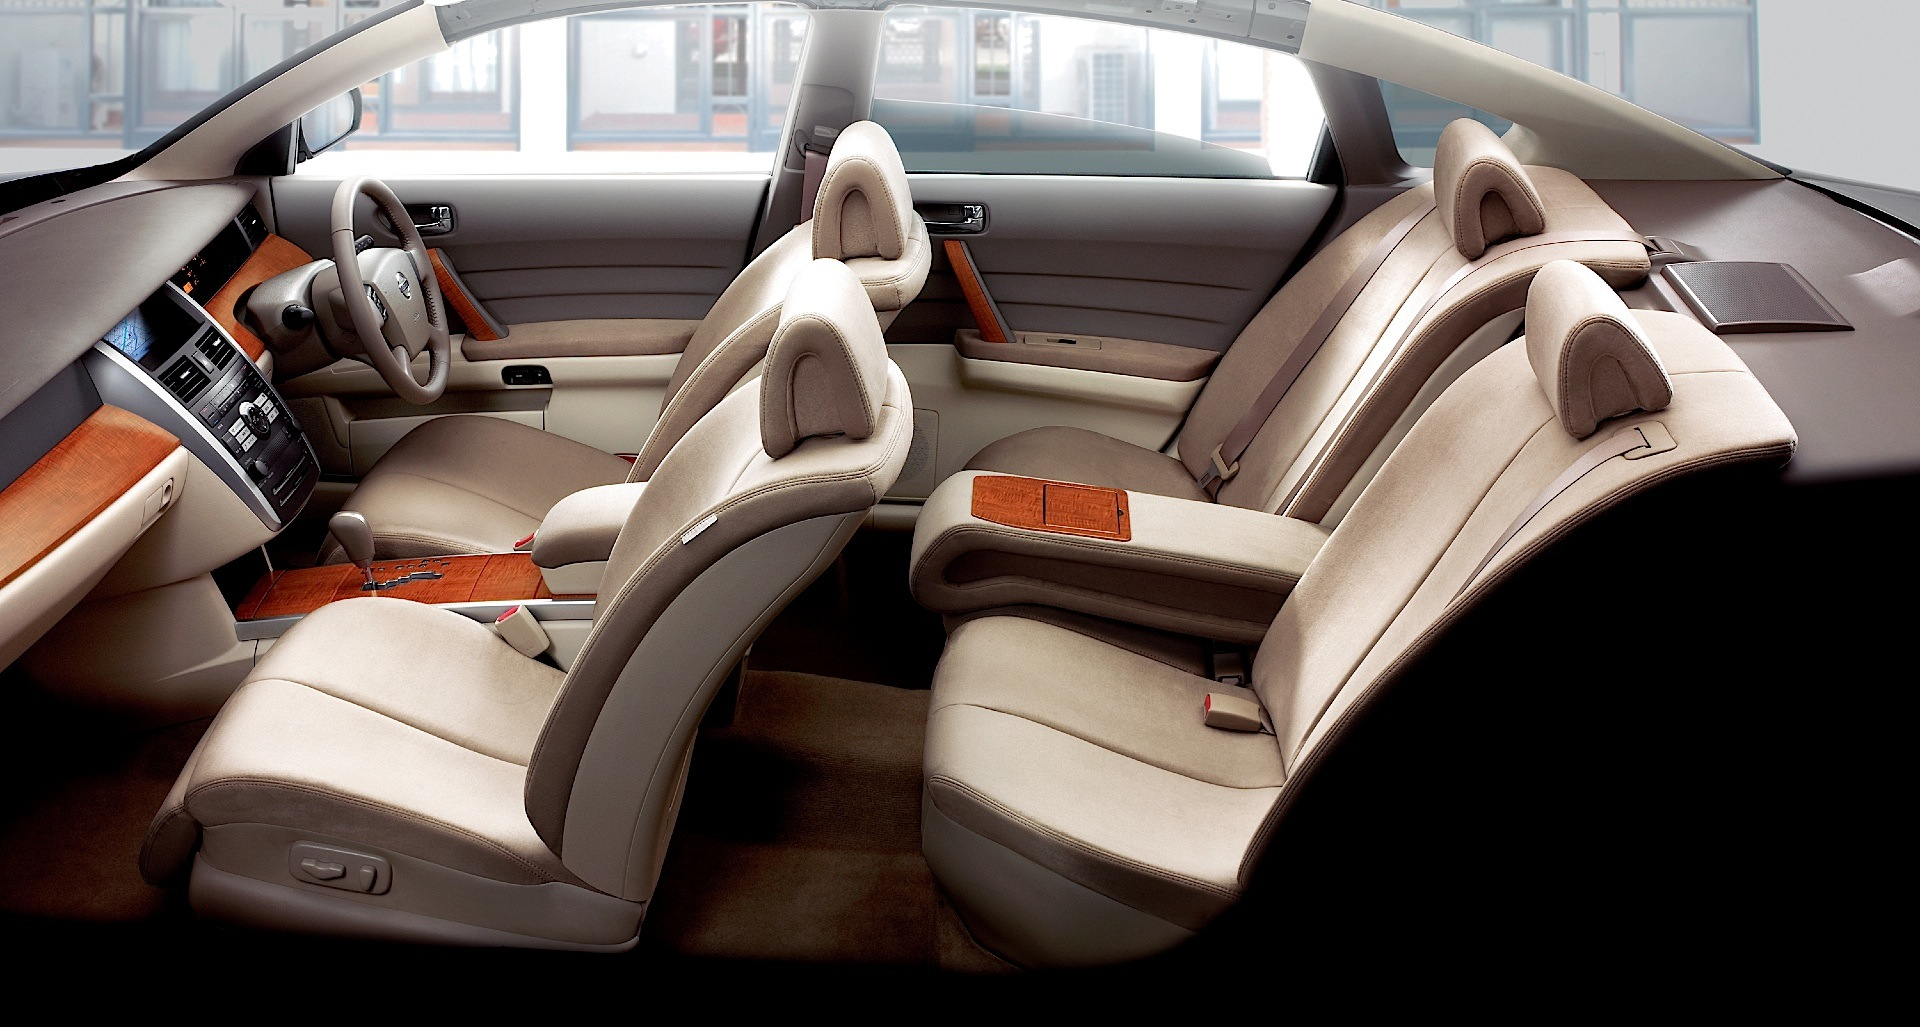 Nissan Maxima 2017 Interior >> NISSAN Teana - 2003, 2004, 2005, 2006, 2007, 2008, 2009 - autoevolution